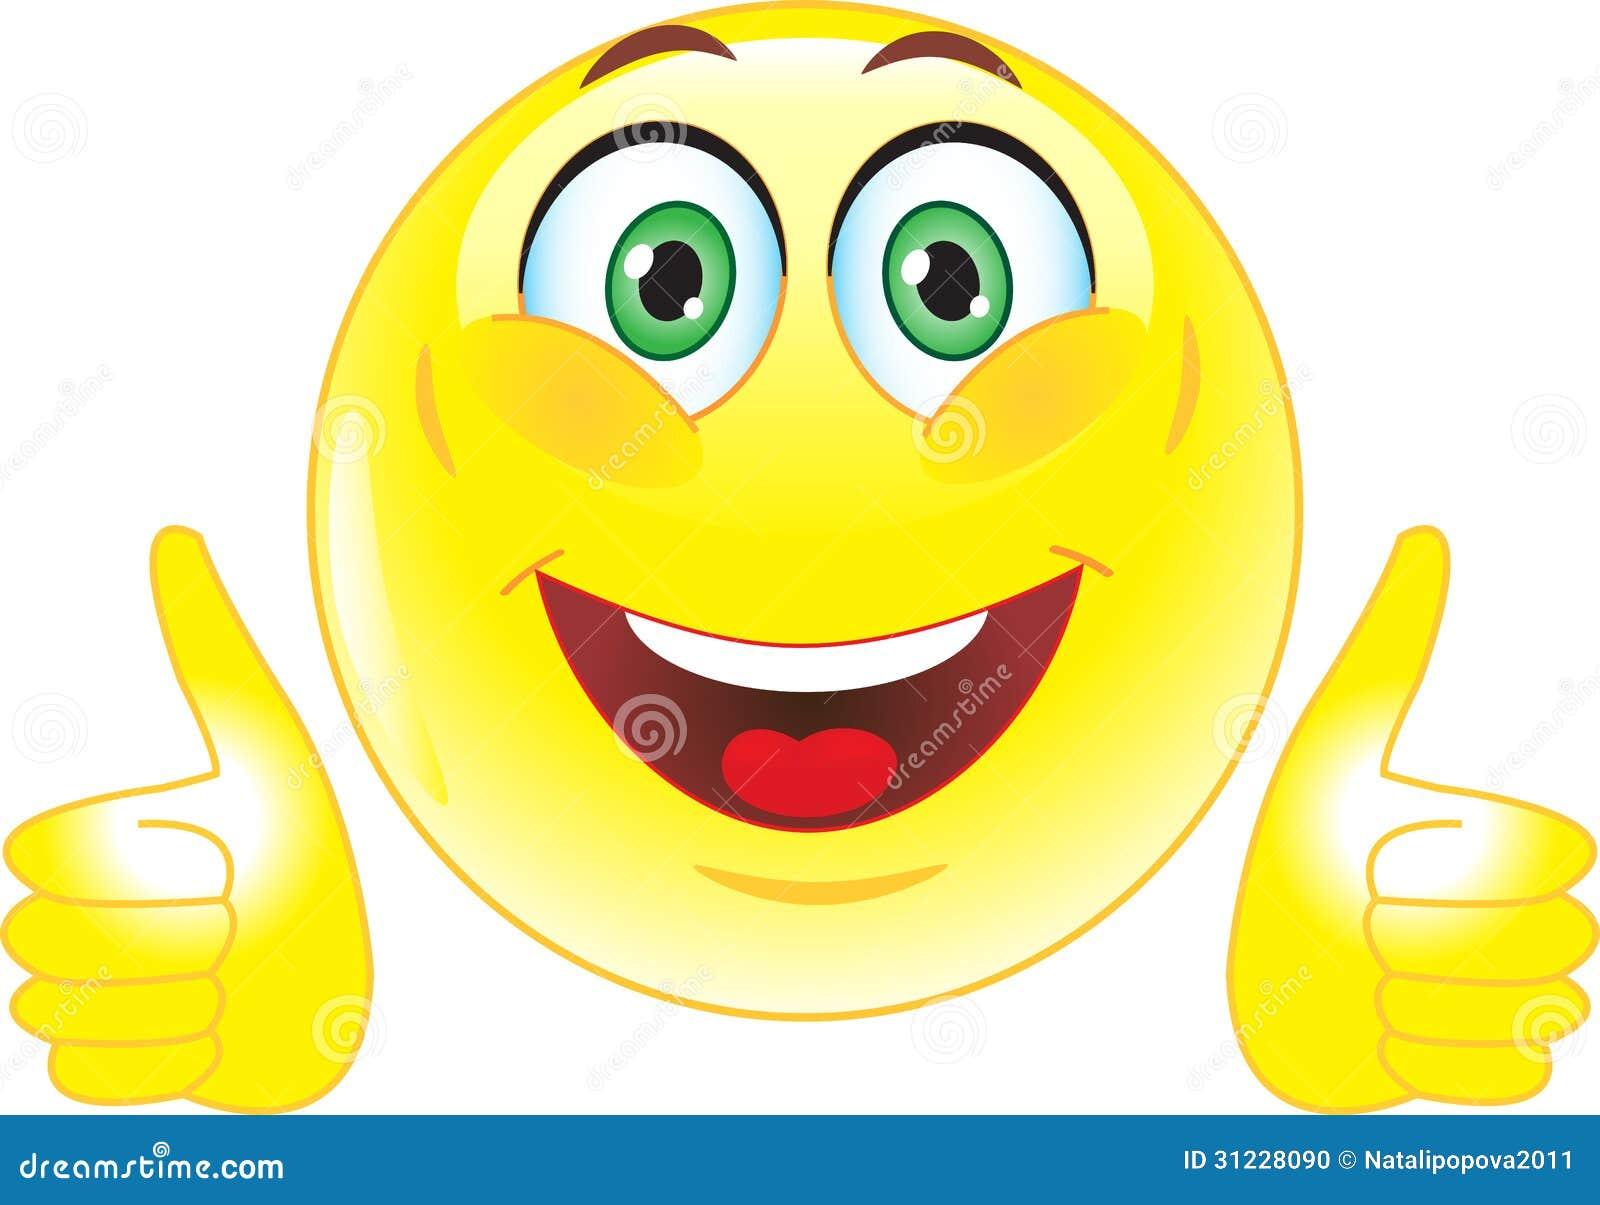 smile joy all right stock photo image 31228090 Thinking Smiley Face Clip Art Winking Smiley Face Clip Art